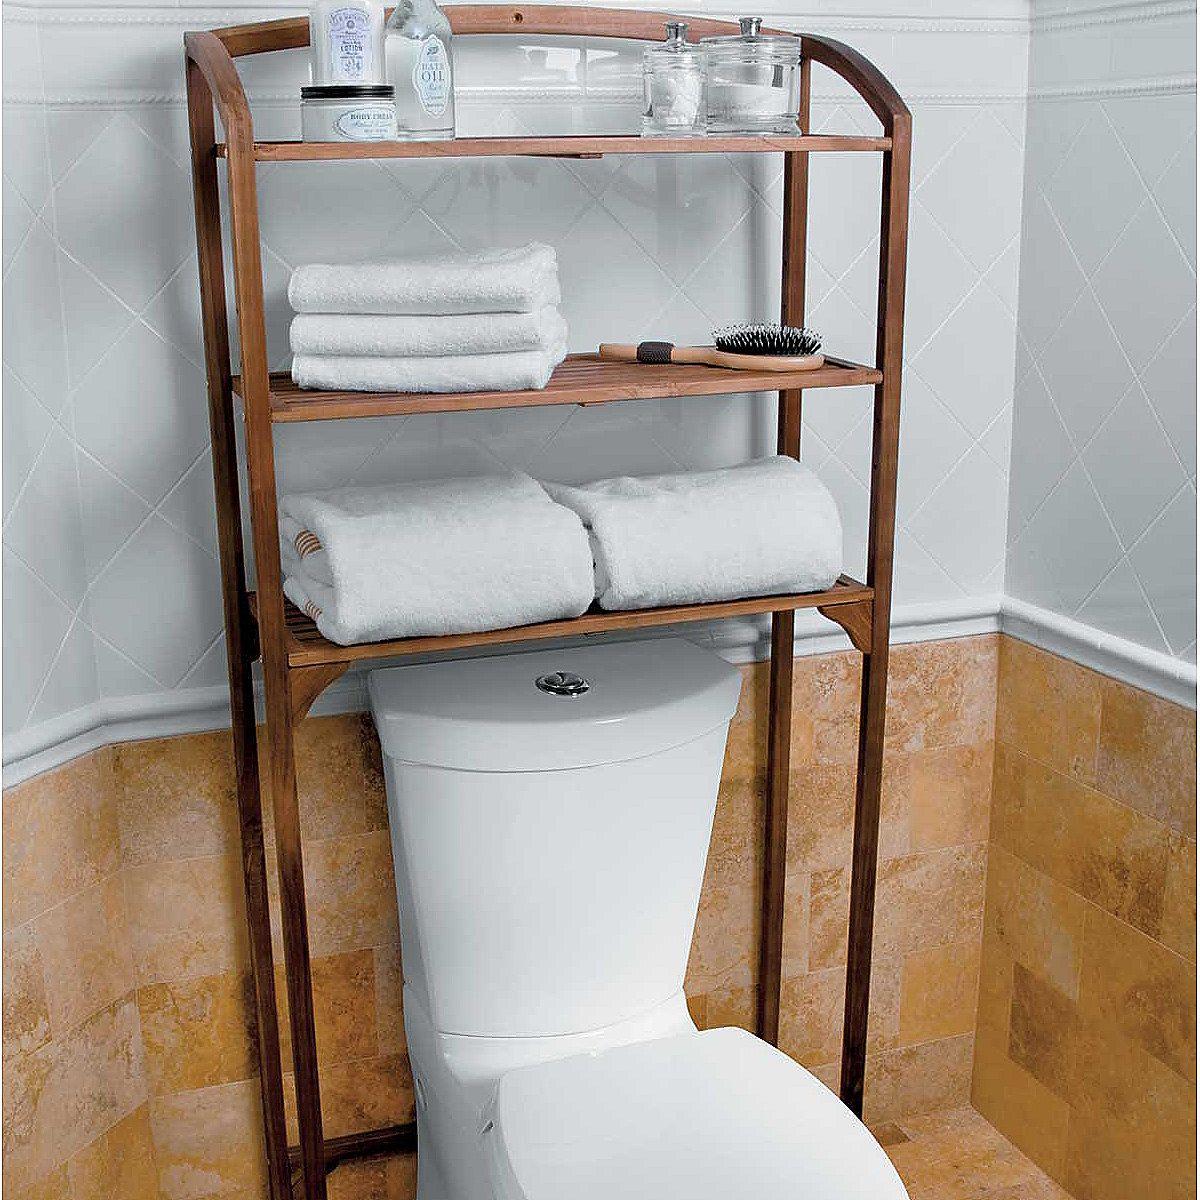 Teak bathroom space saver - Teak Bathroom Space Saver